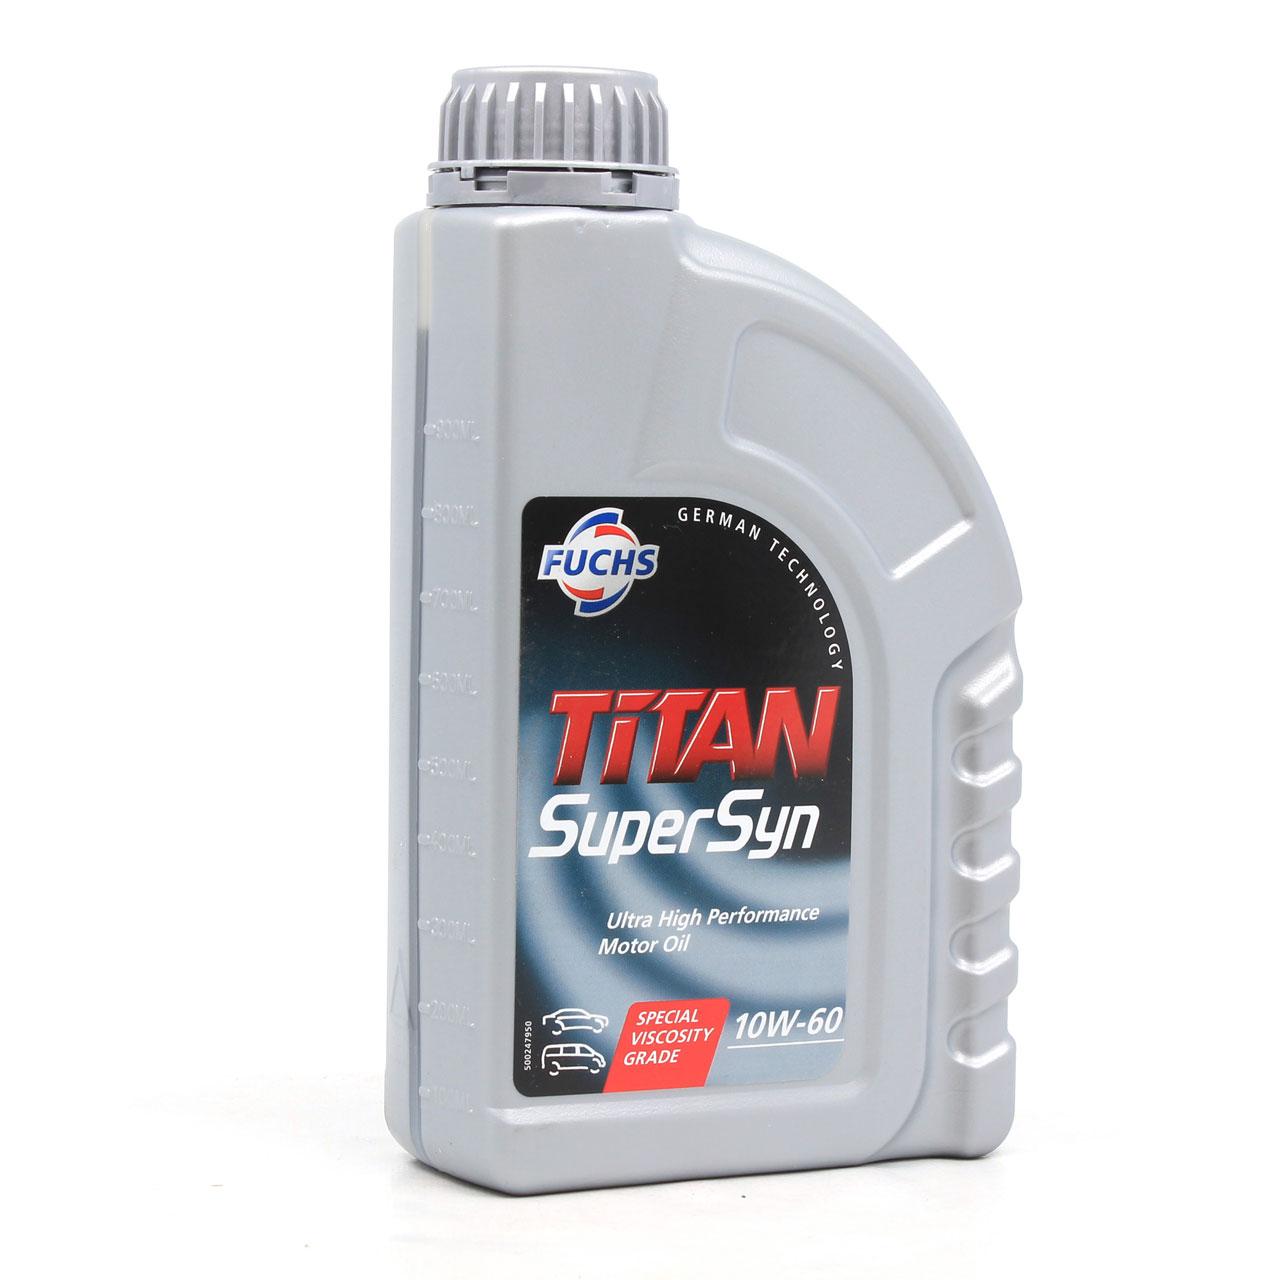 FUCHS Motoröl Öl TITAN SuperSyn ACEA A3/B3 SL/CF 10W-60 10W60 - 10L 10 Liter